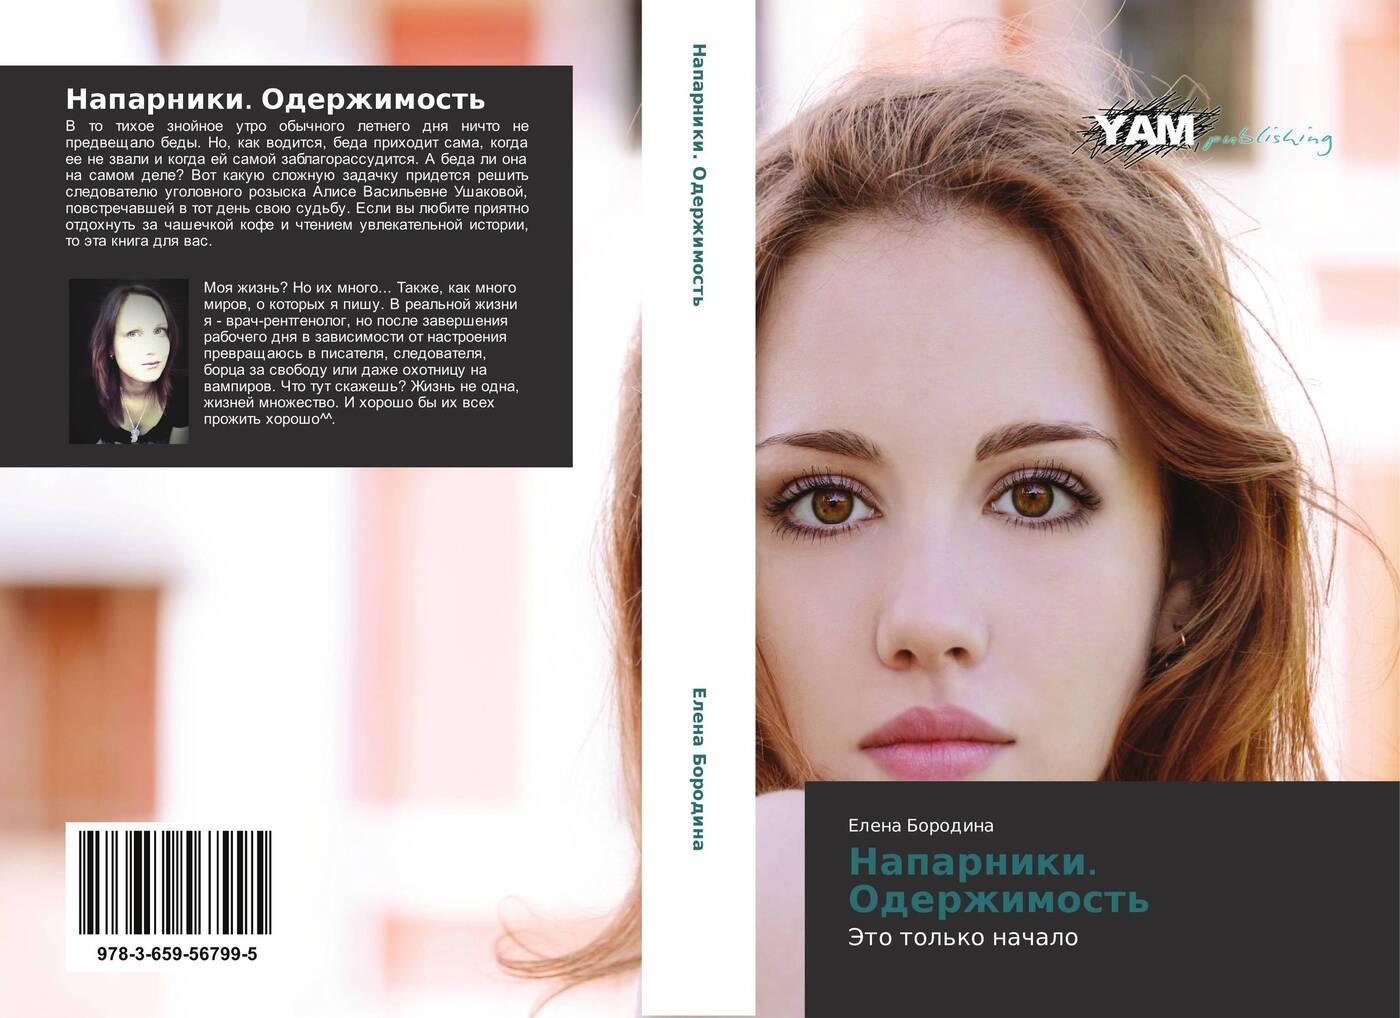 Елена Бородина Напарники. Одержимость